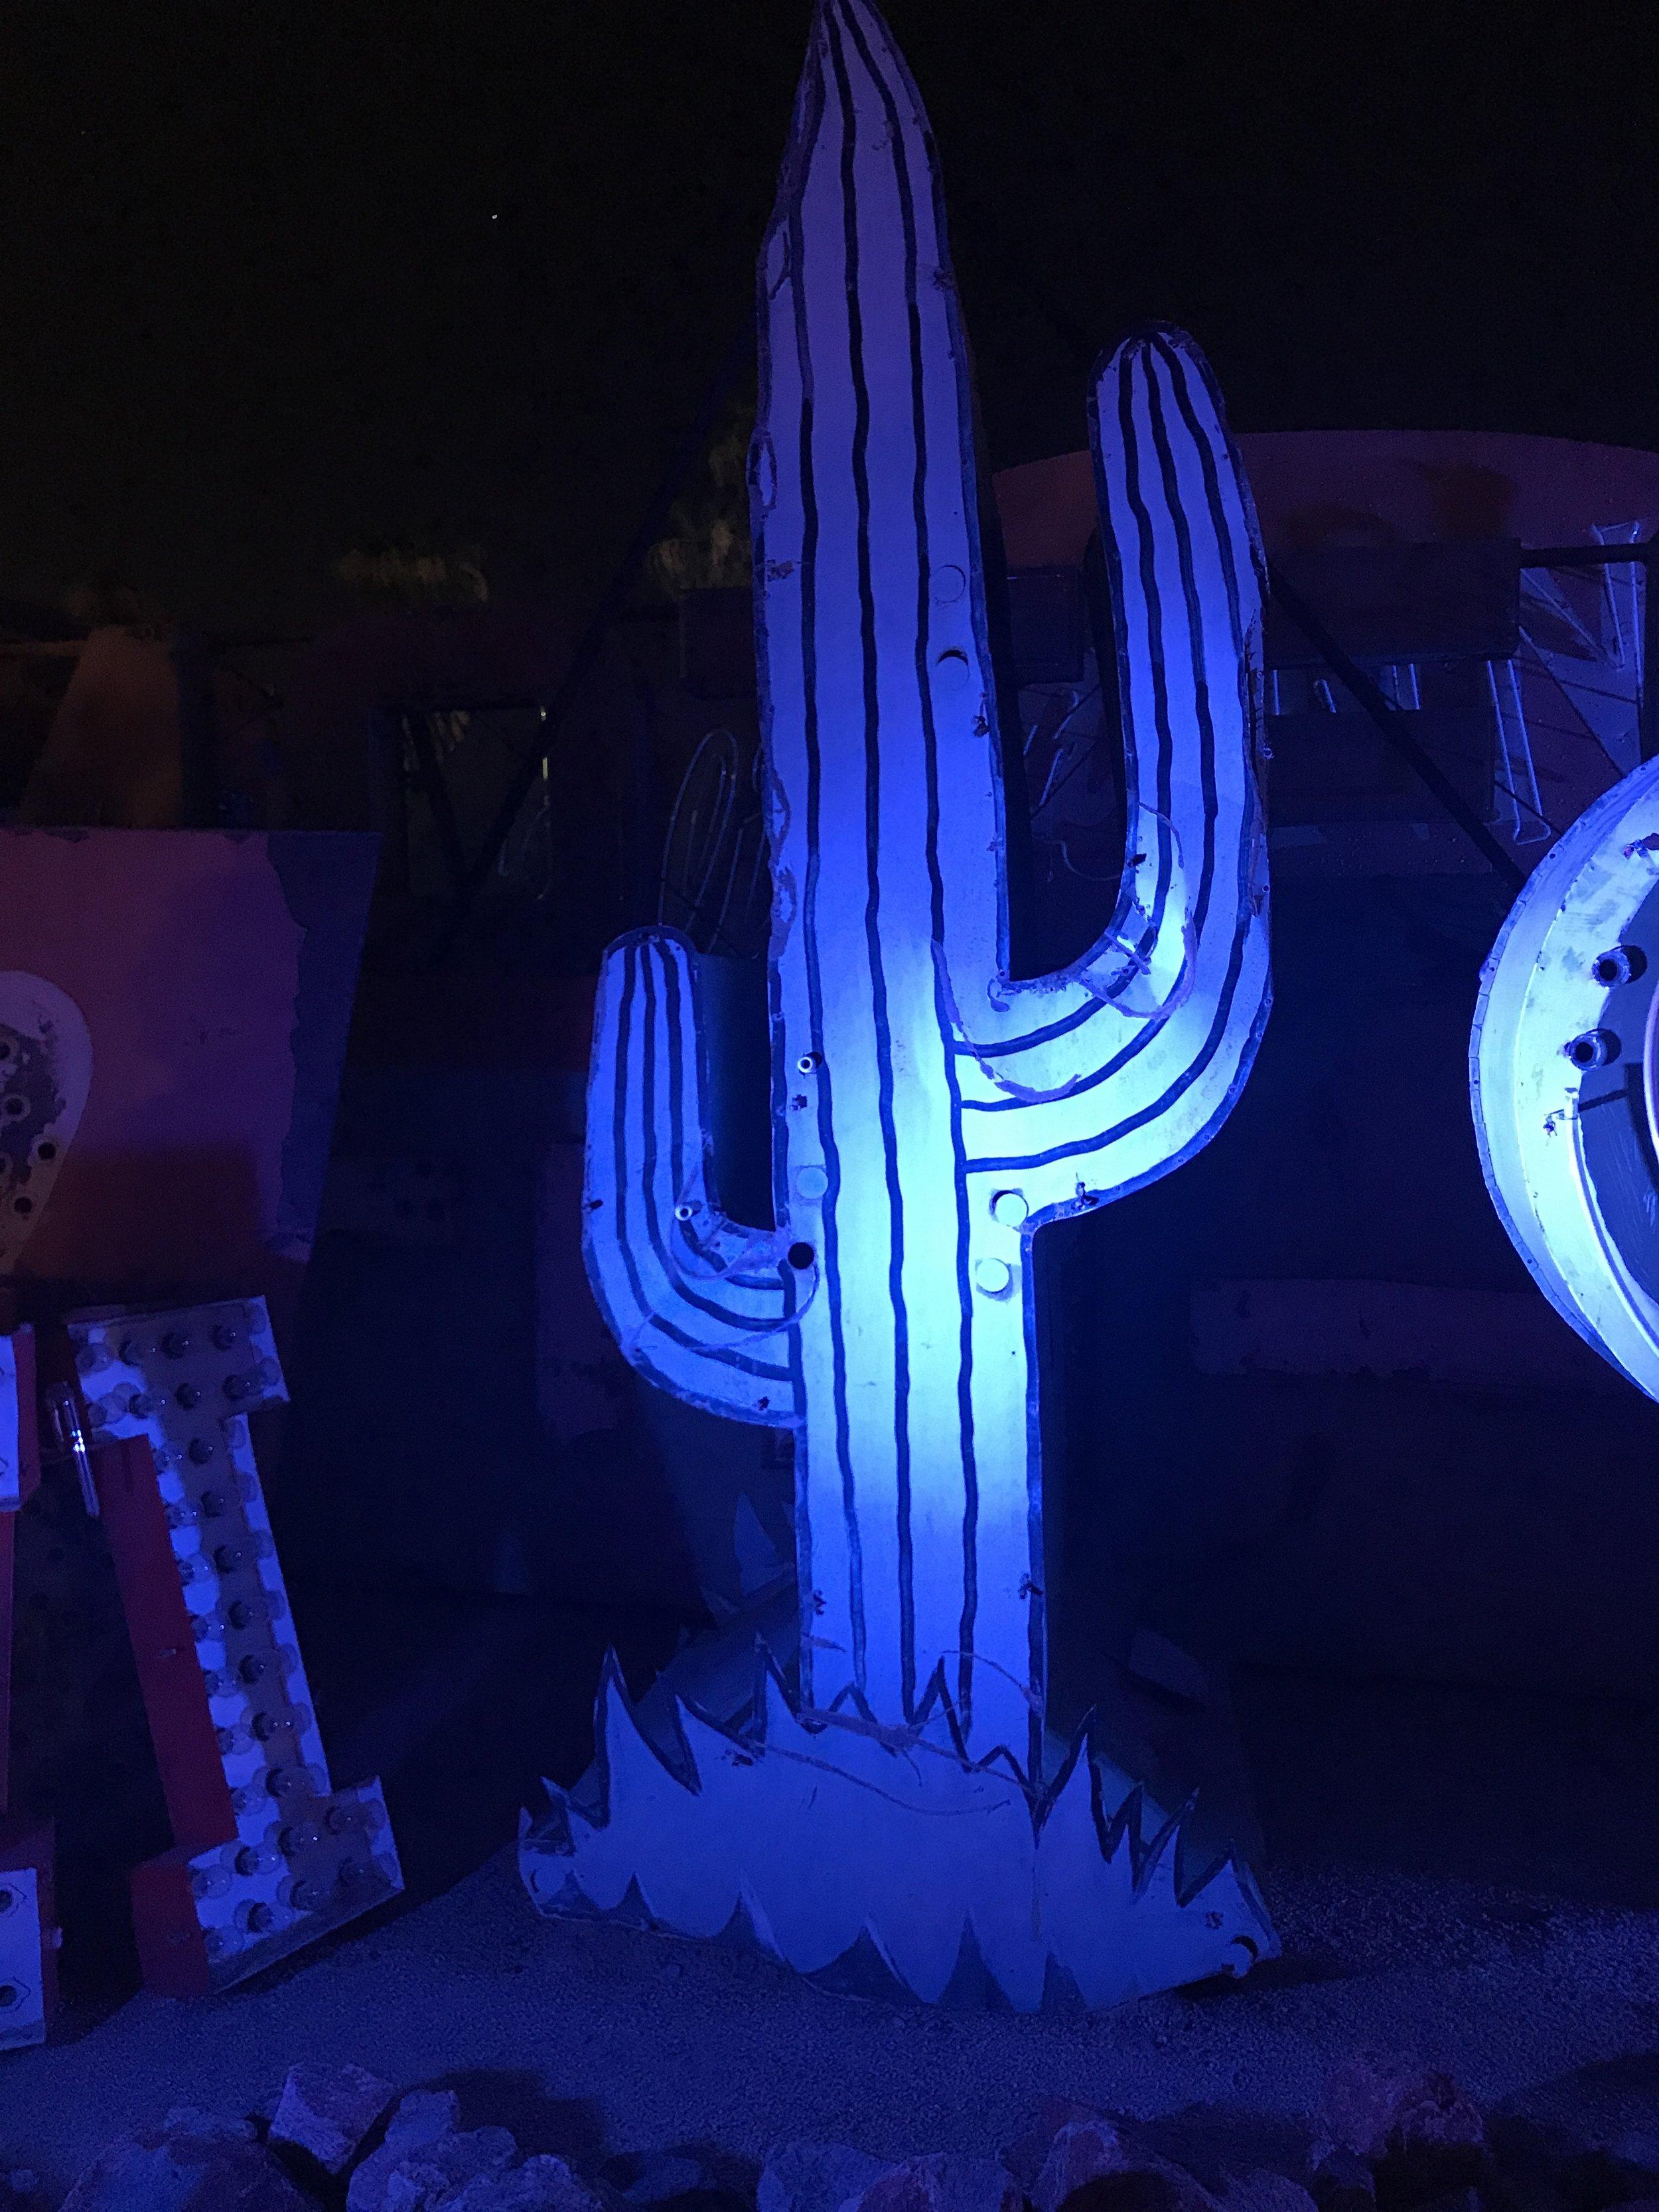 neon museum ghost town las vegas cactus